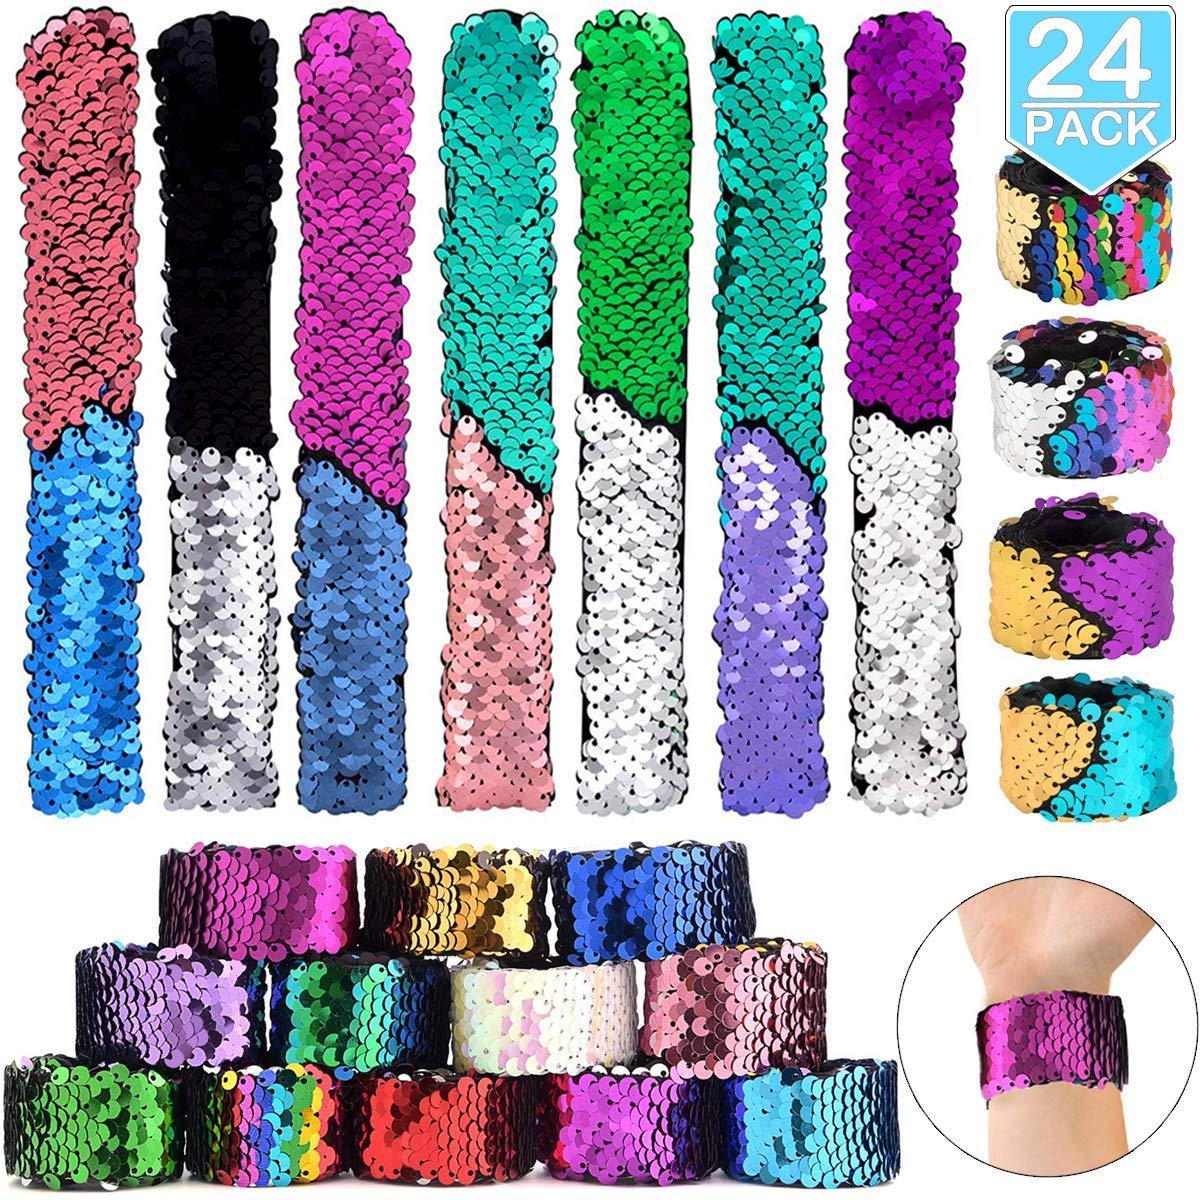 POKONBOY 24 Pack Mermaid Slap Bracelets Mermaid Party Favors, Two-Color Decorative Reversible Sequin Bracelets,Birthday Party Favors Supplies Gifts for Girls Kids, Pink Blue Purple by POKONBOY